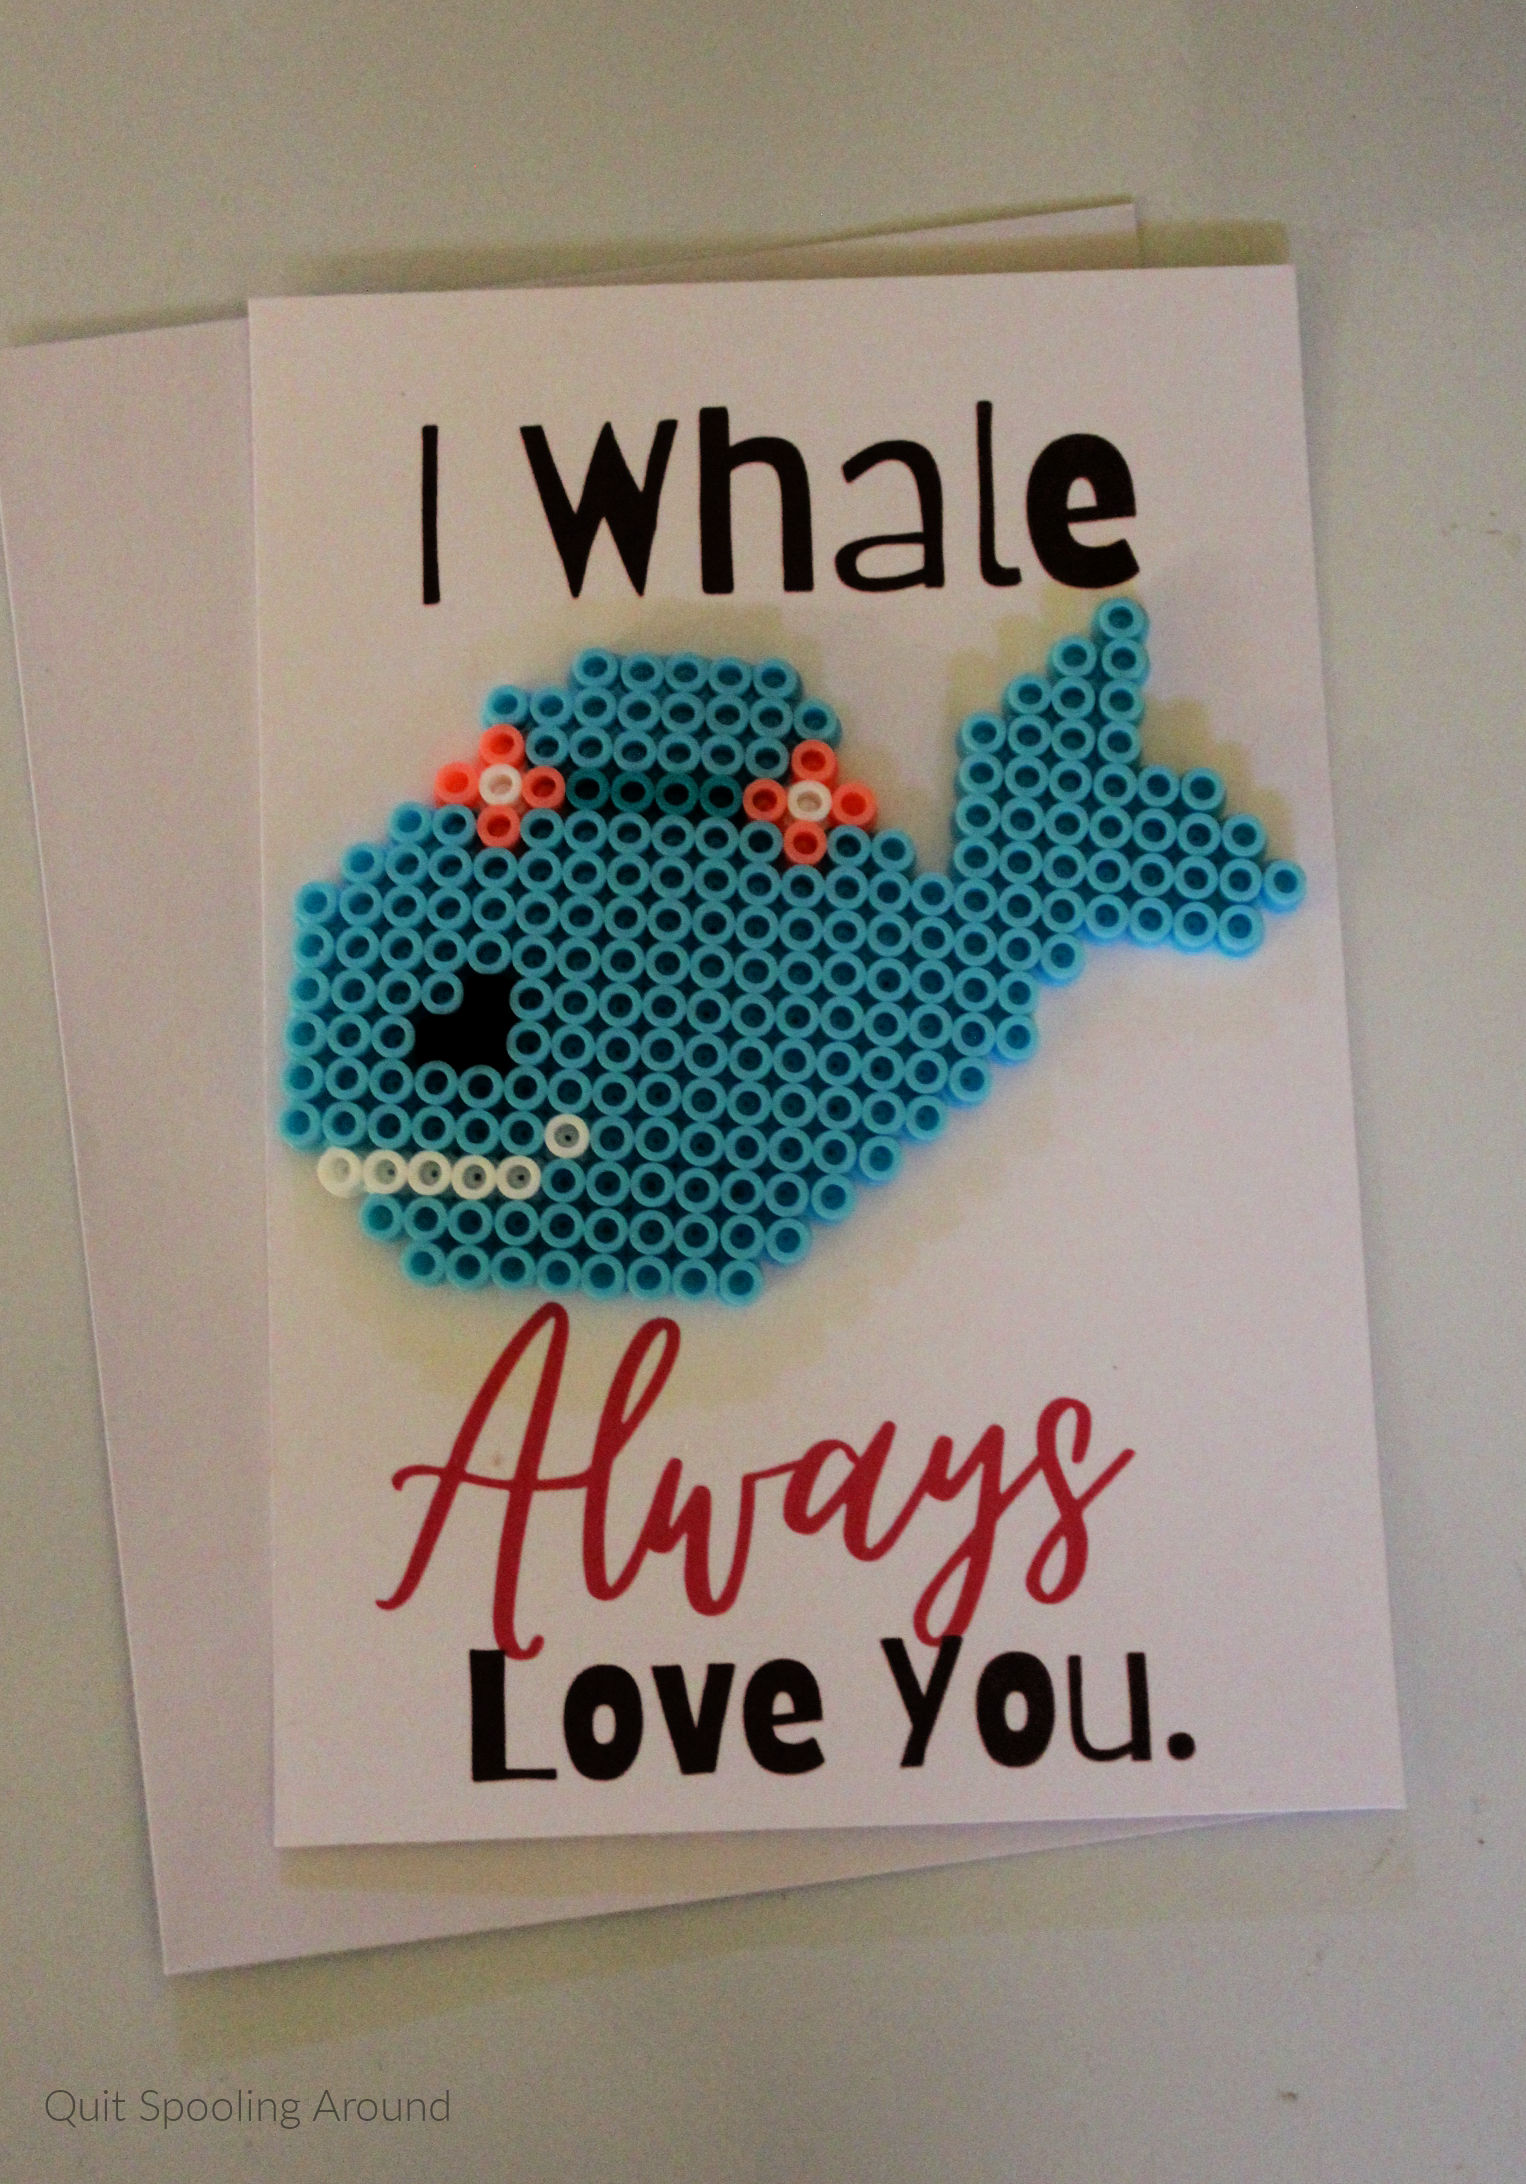 "<span itemprop=""name"">I Whale Always Love You Perler Bead Card</span>"